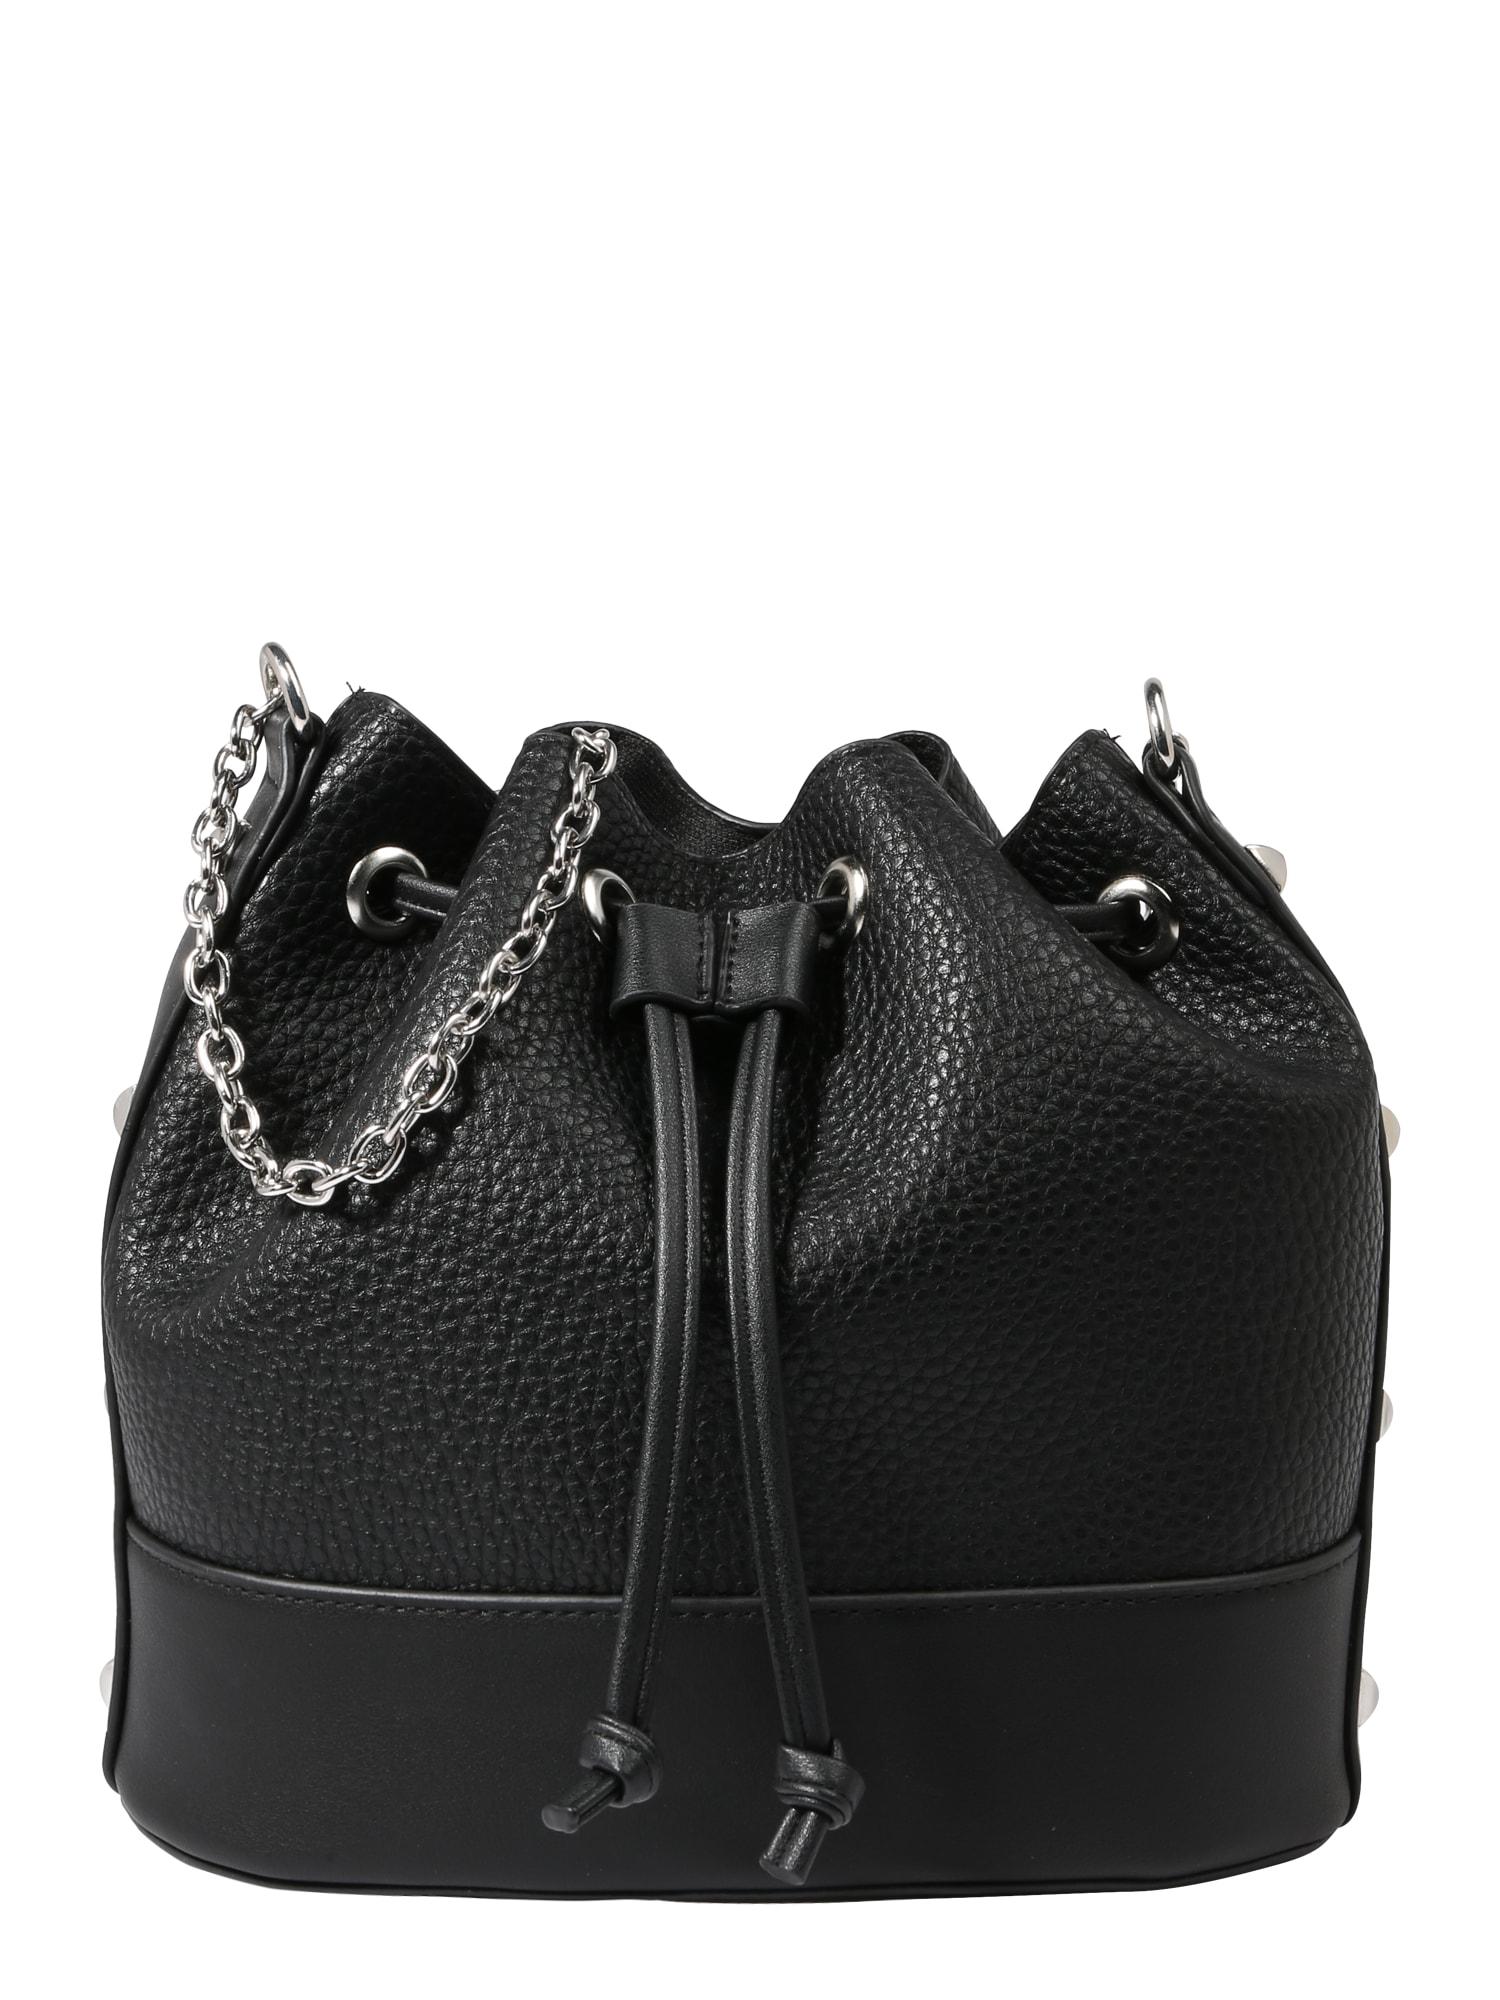 Vak PCPINA BUCKET BAG černá PIECES